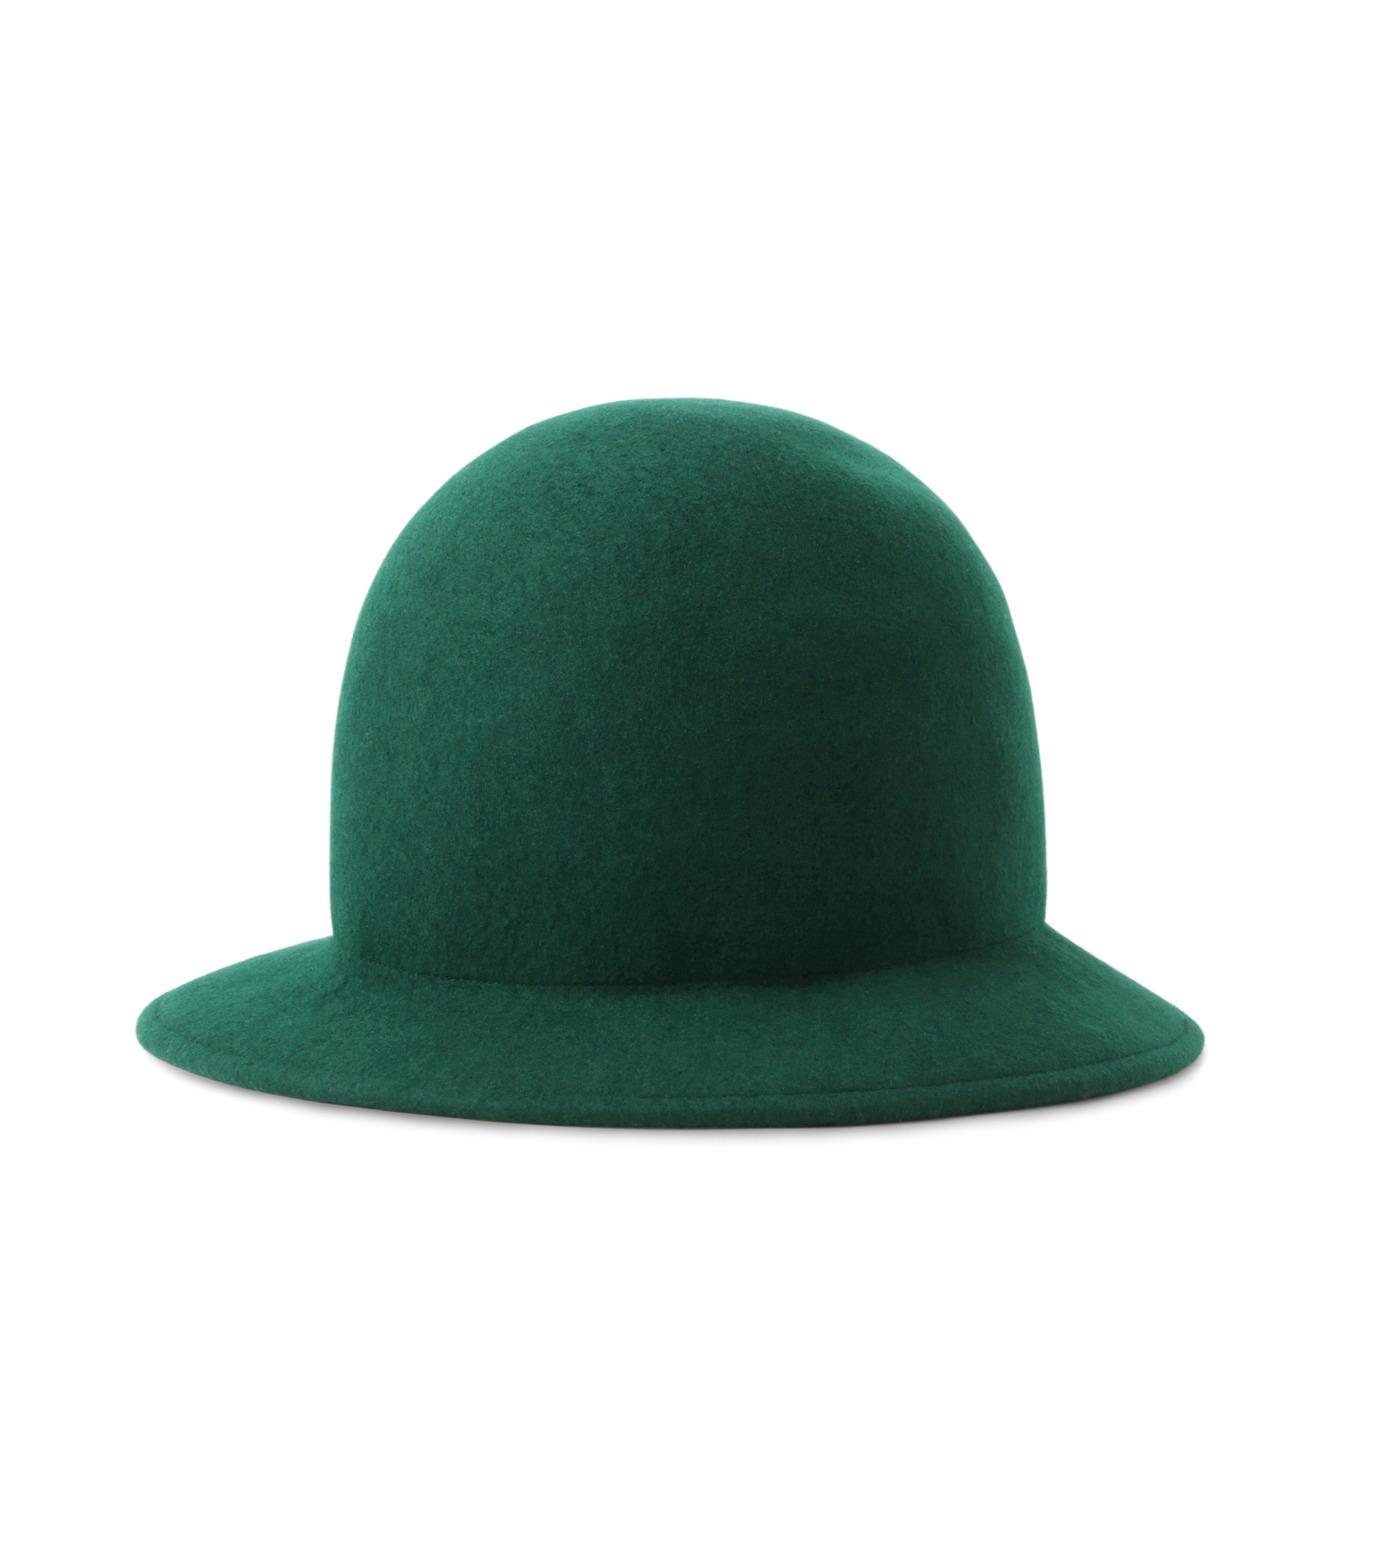 Sacai(サカイ)のHat-GREEN(キャップ/cap)-17-01274M-22 拡大詳細画像2